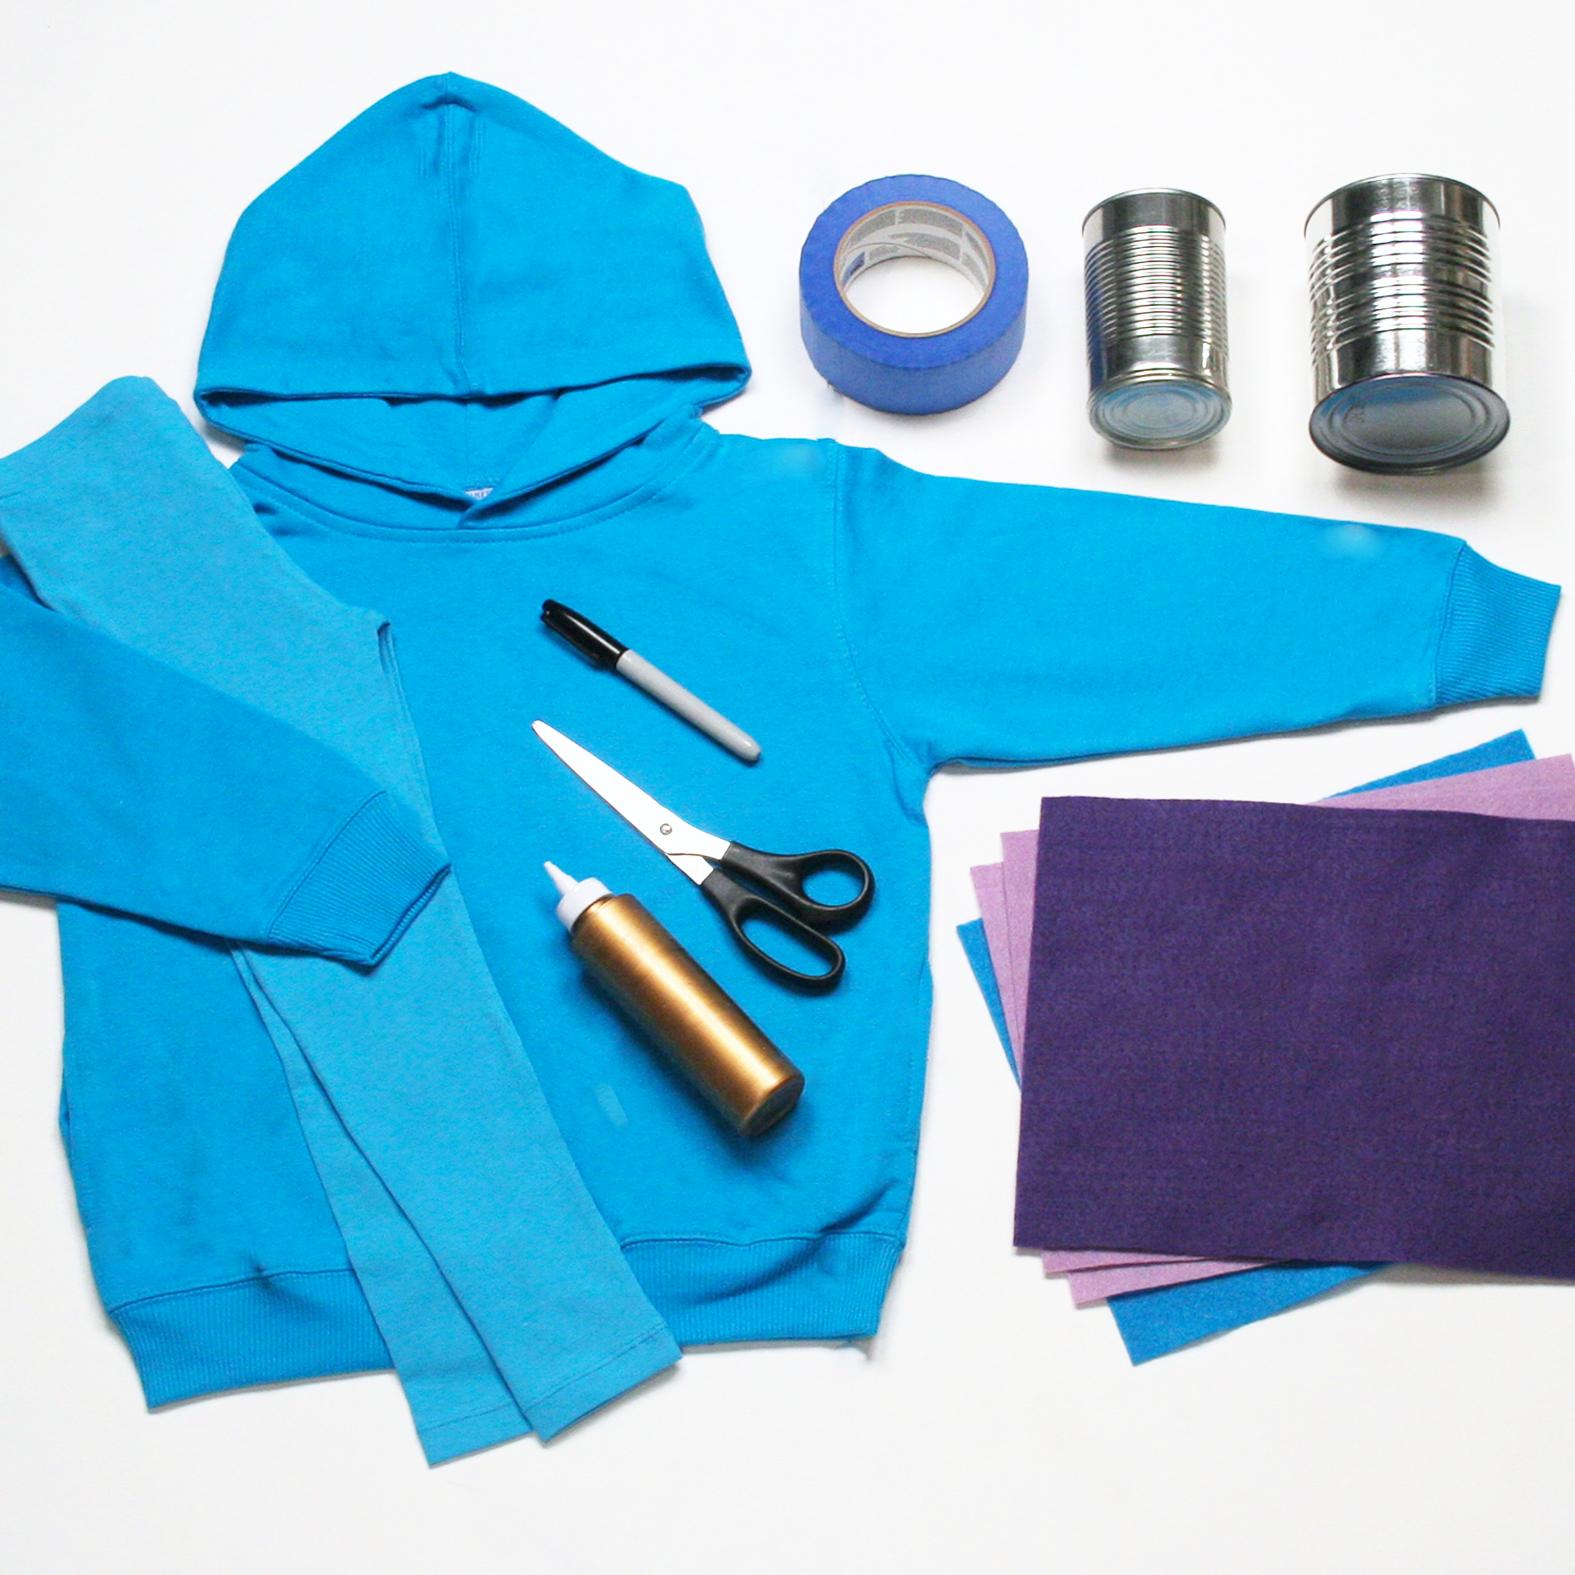 Eep costume materials